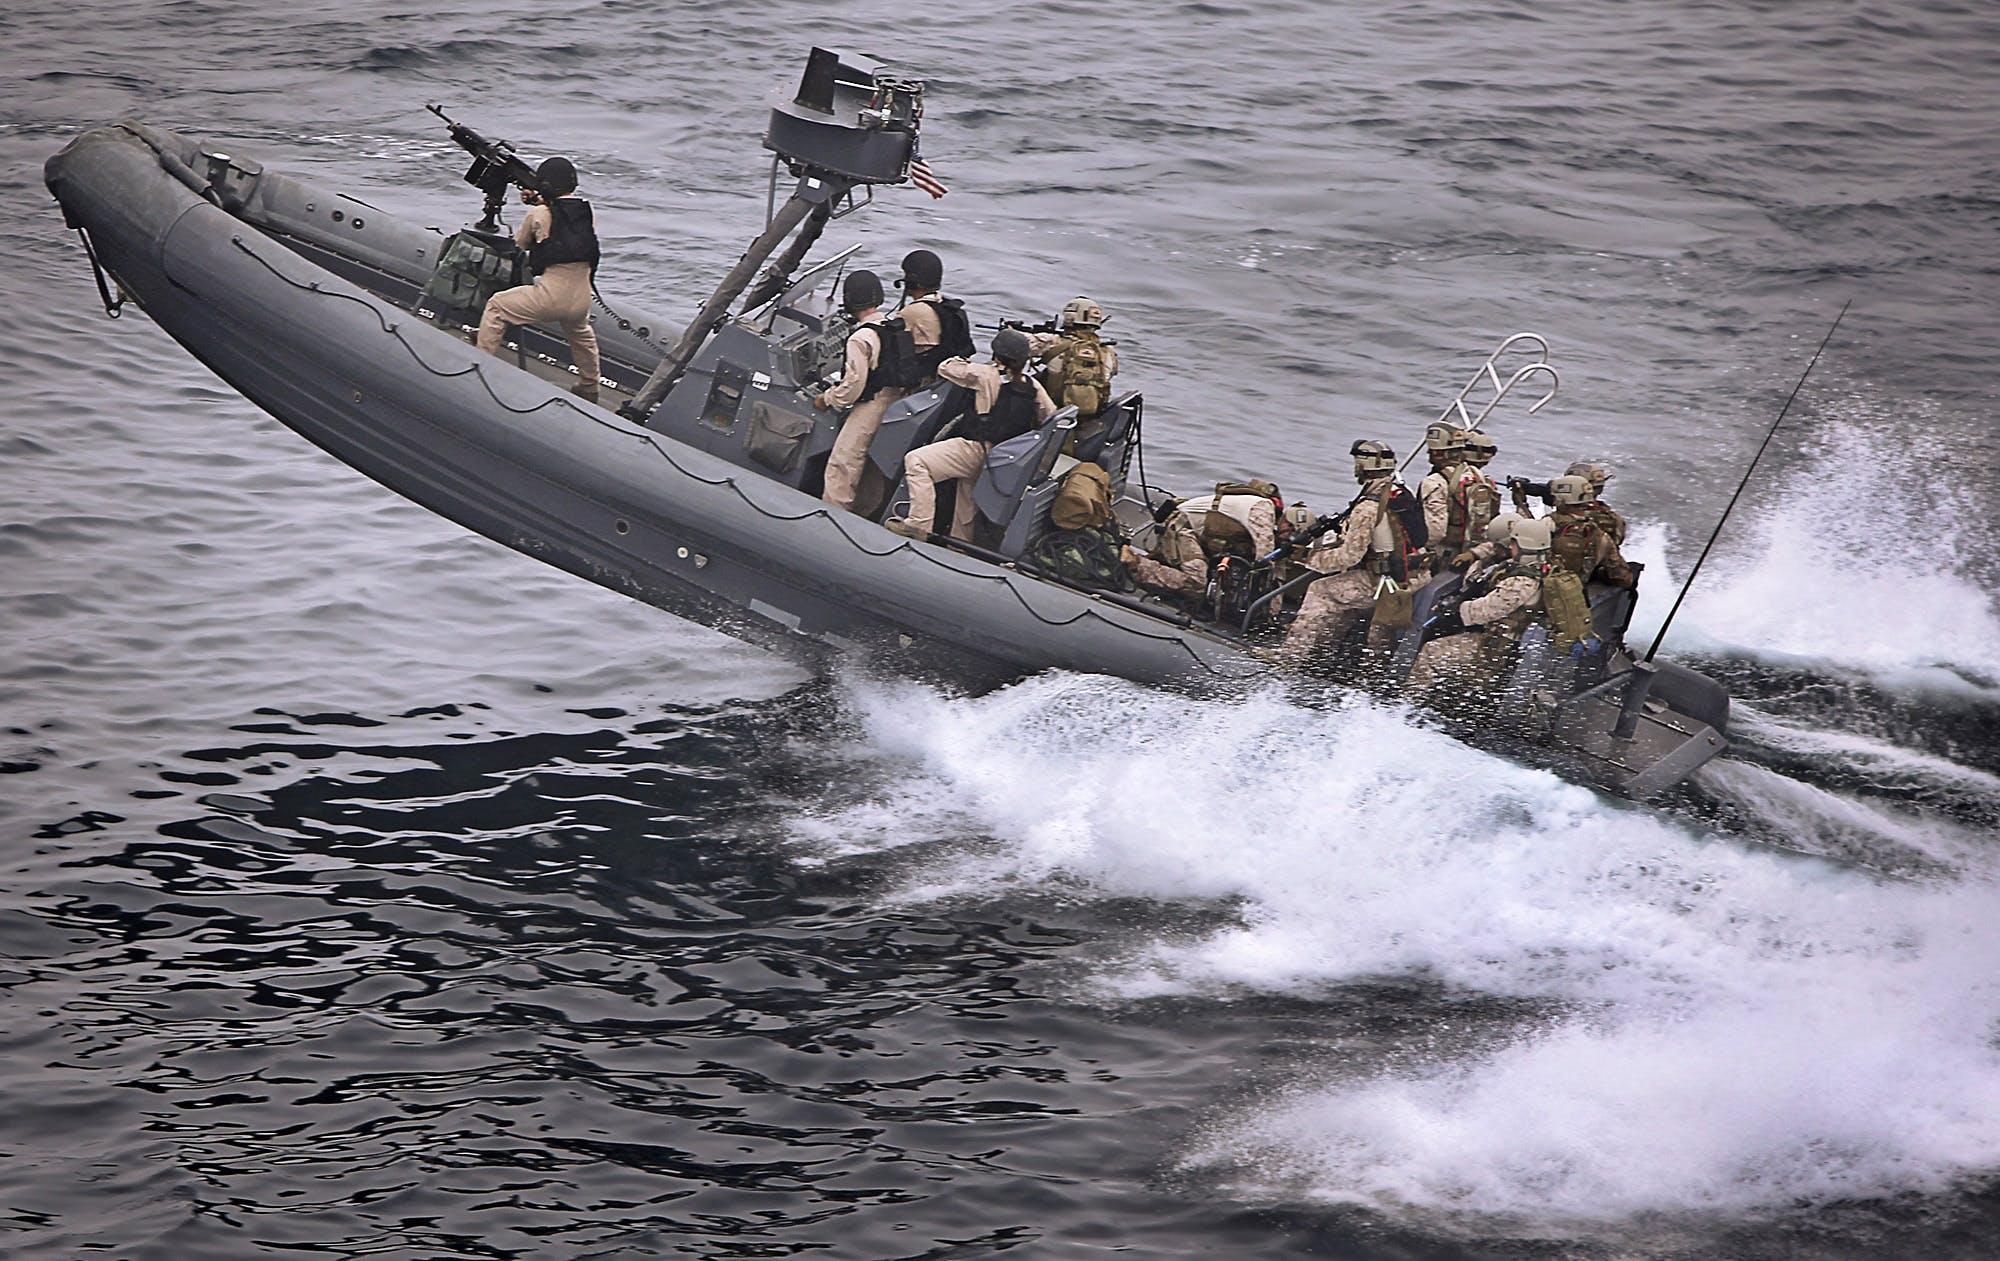 barca, blau marí, exèrcit